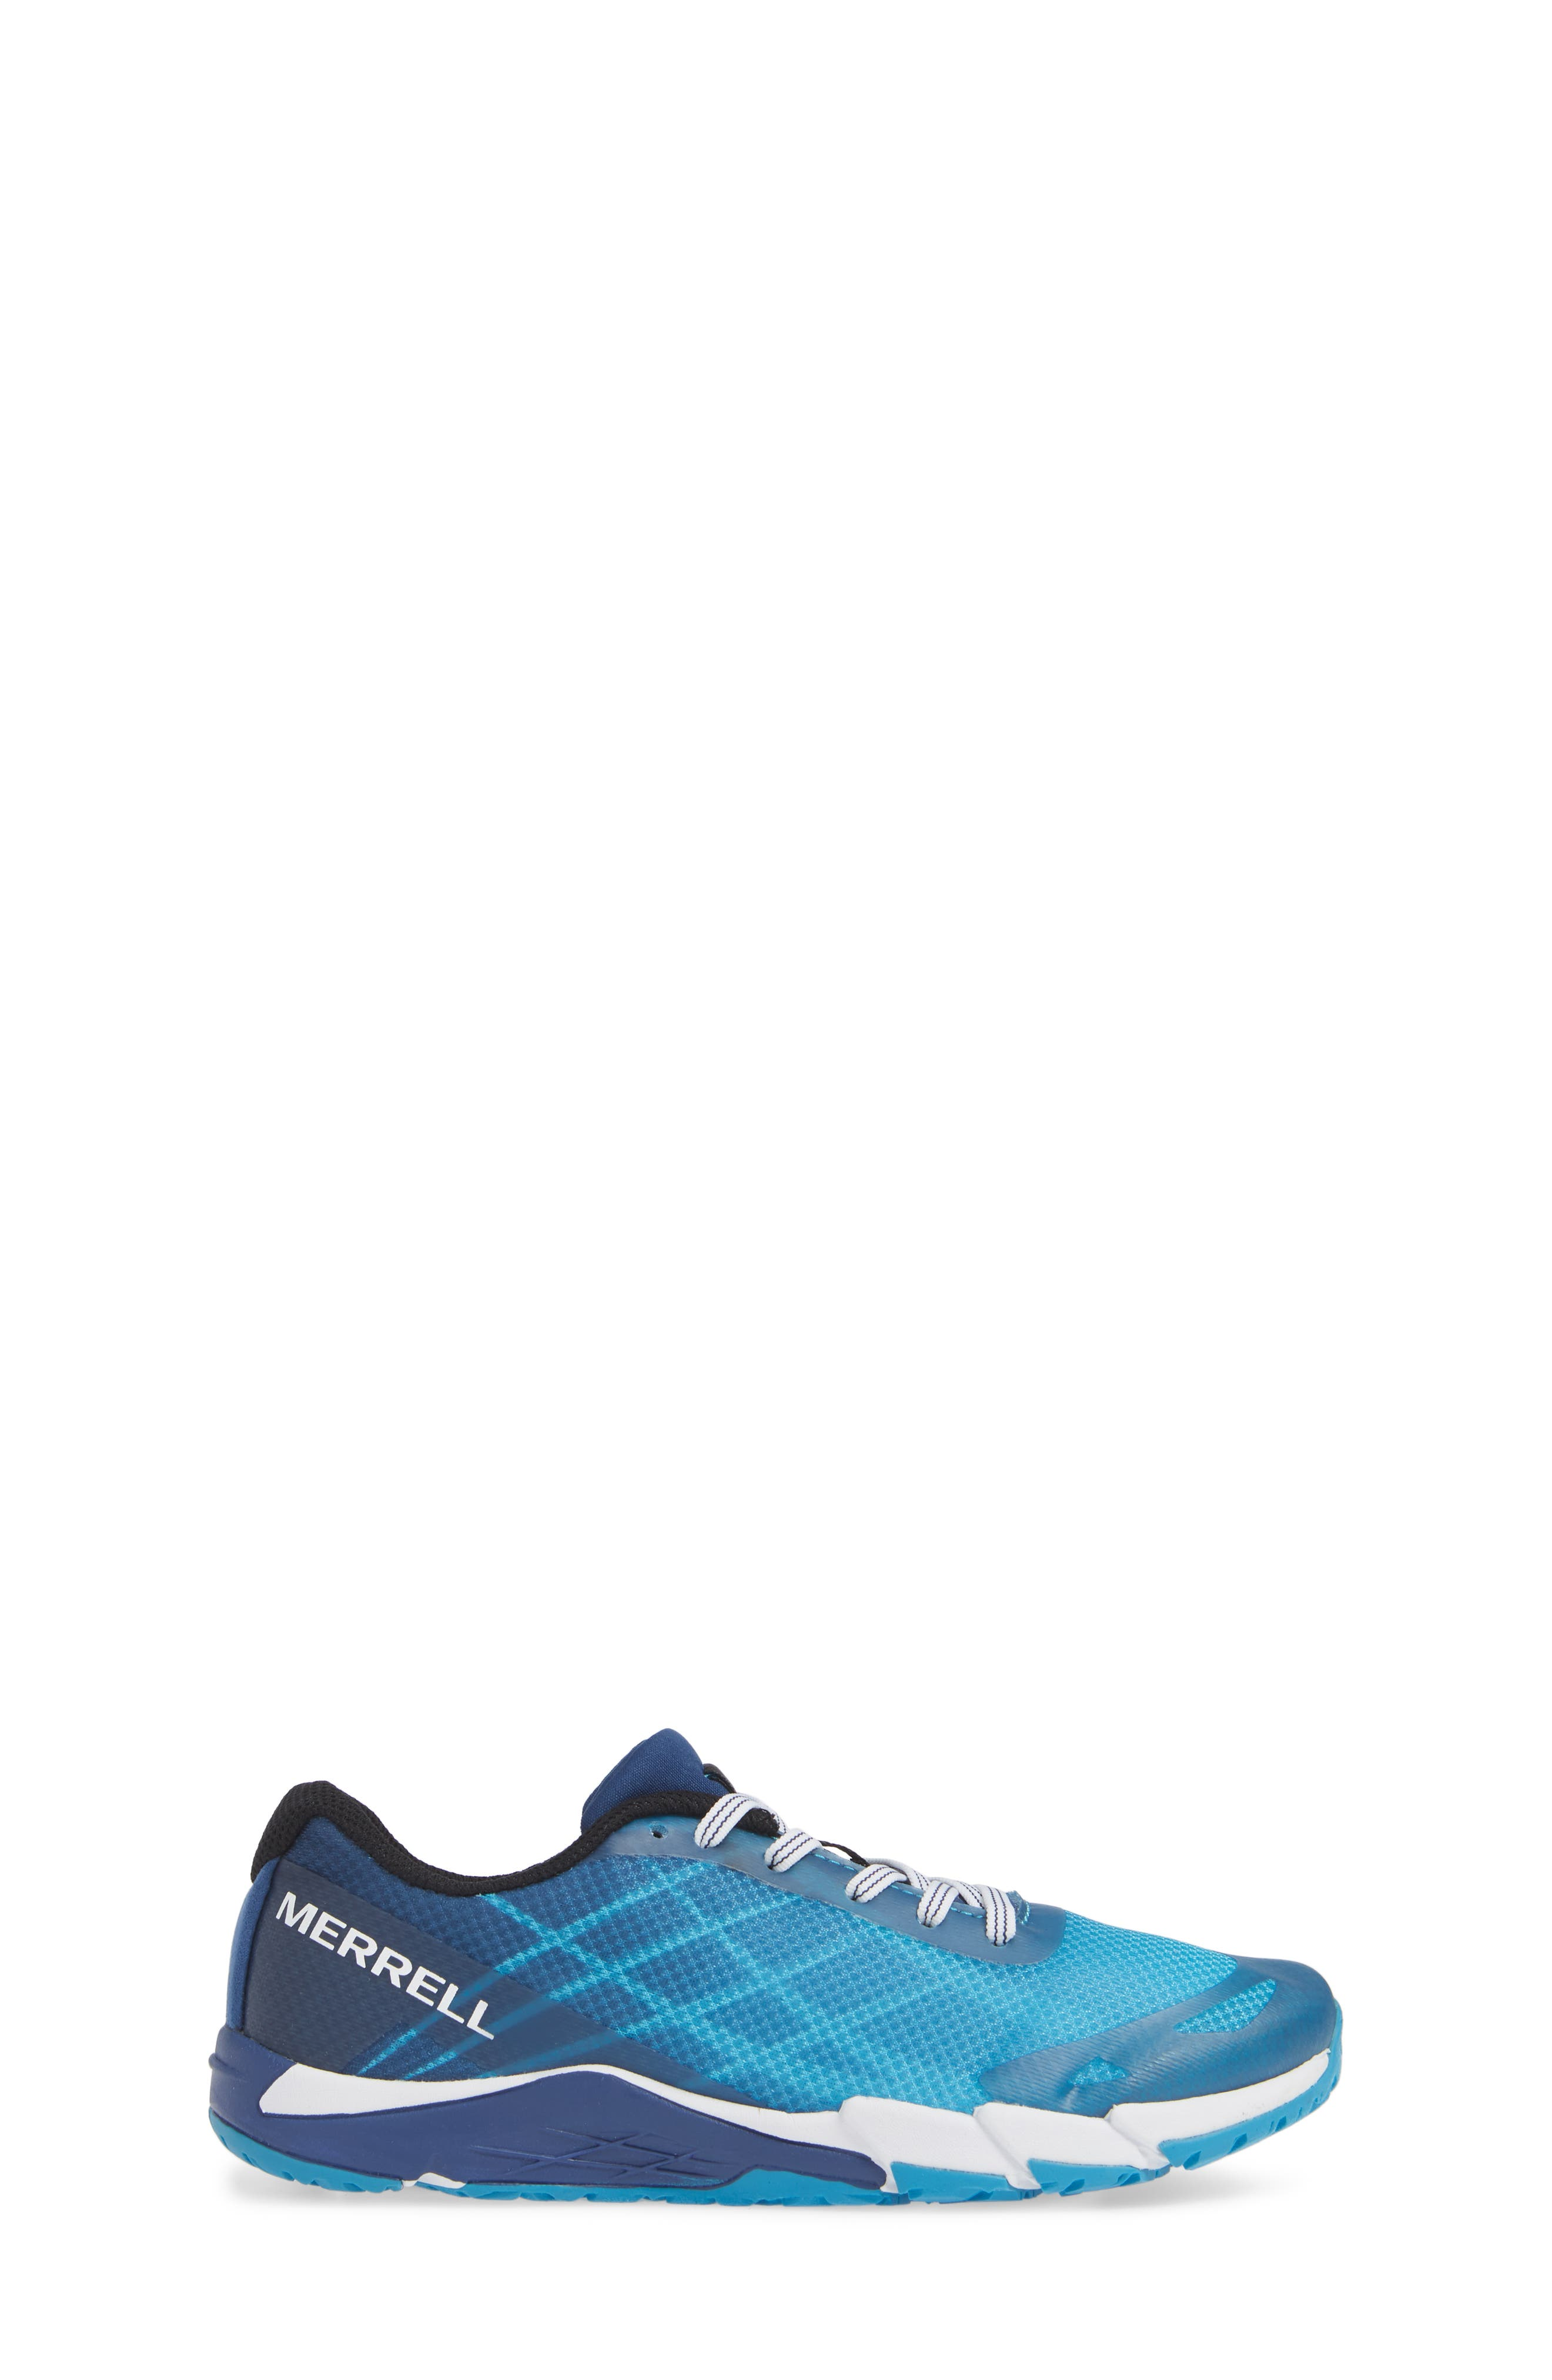 MERRELL, Bare Access Sneaker, Alternate thumbnail 3, color, BLUE SYNTHETIC